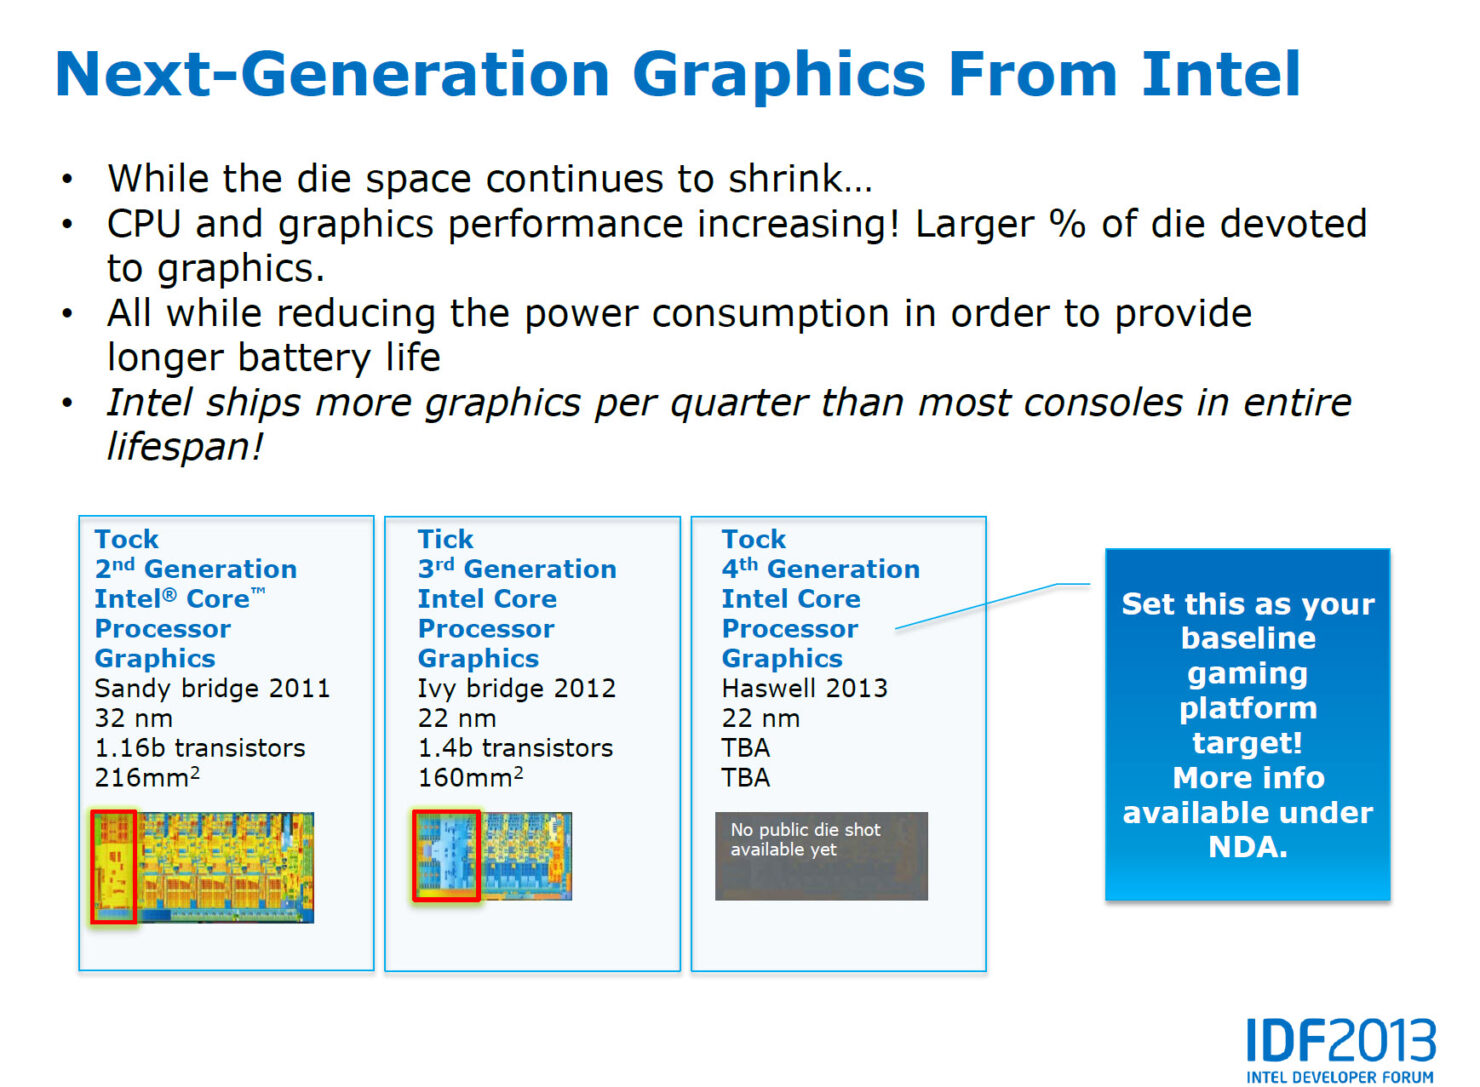 intel-hd-graphics-pc